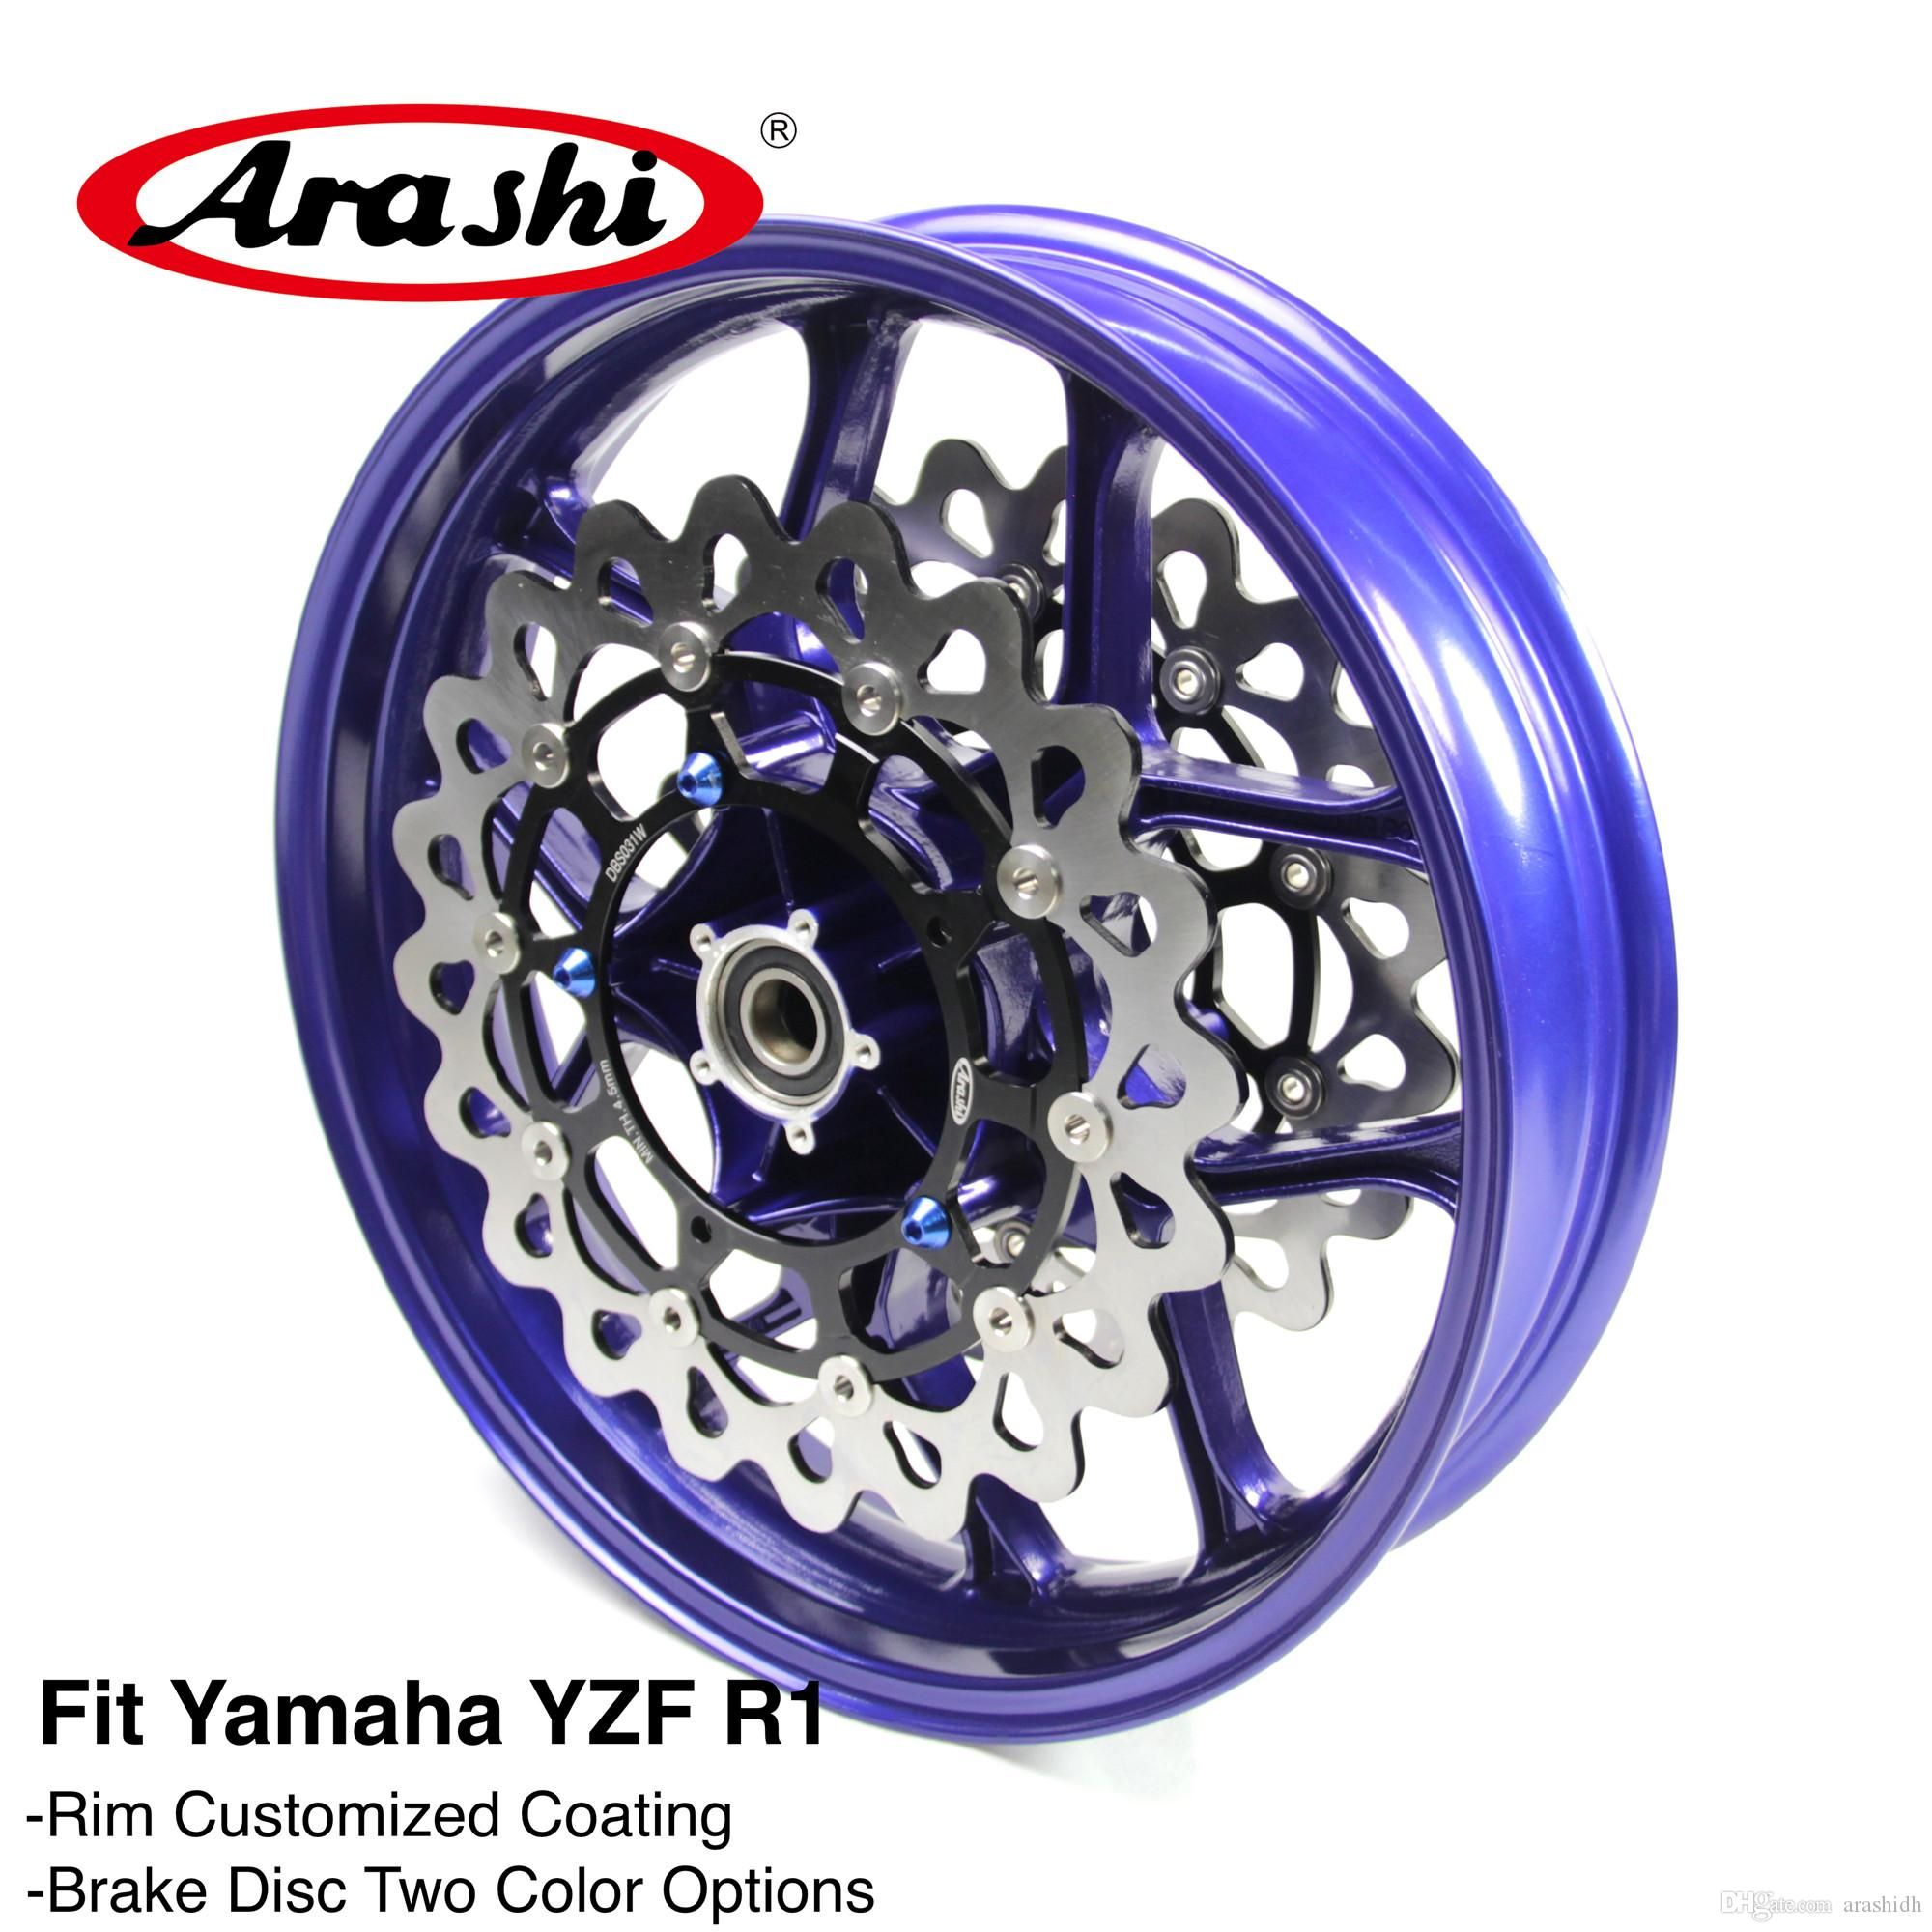 Arashi For Yamaha Yzf R1 2015 2016 2017 Front Wheel Rim Brake Disc Disk Rotor Motorcycle Accessories Yzf R1